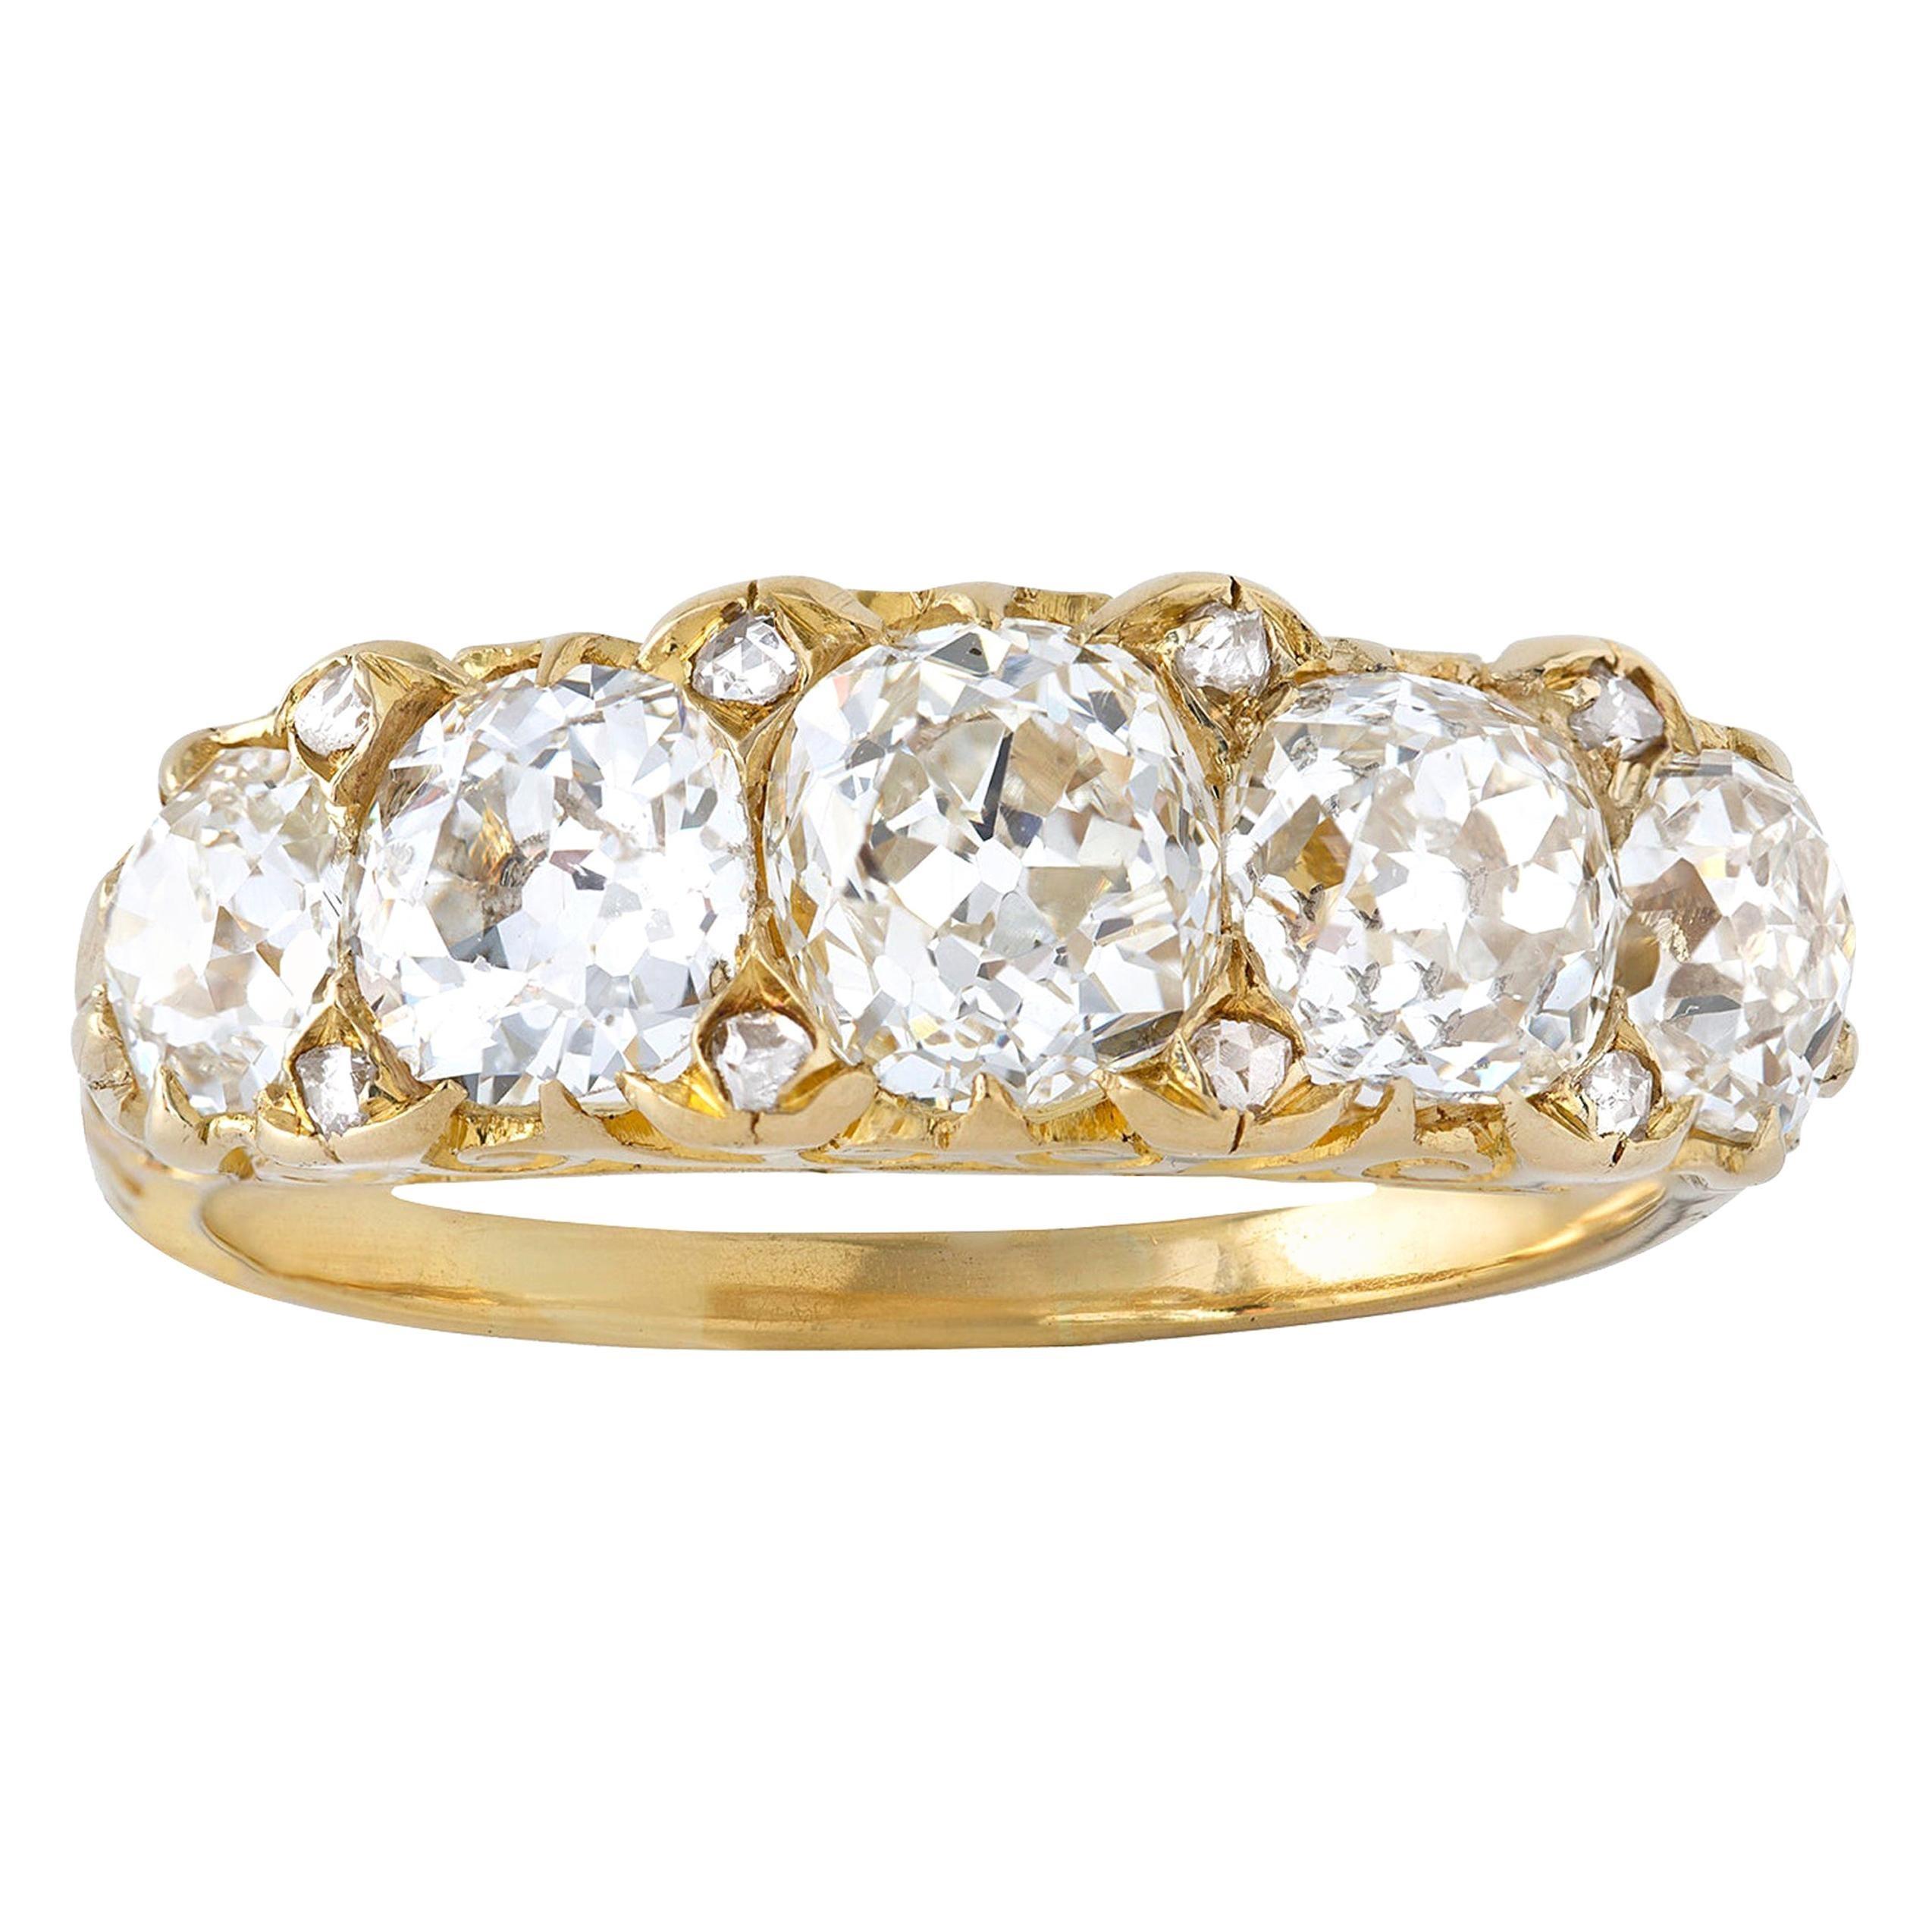 Victorian Five-Stone Diamond Ring